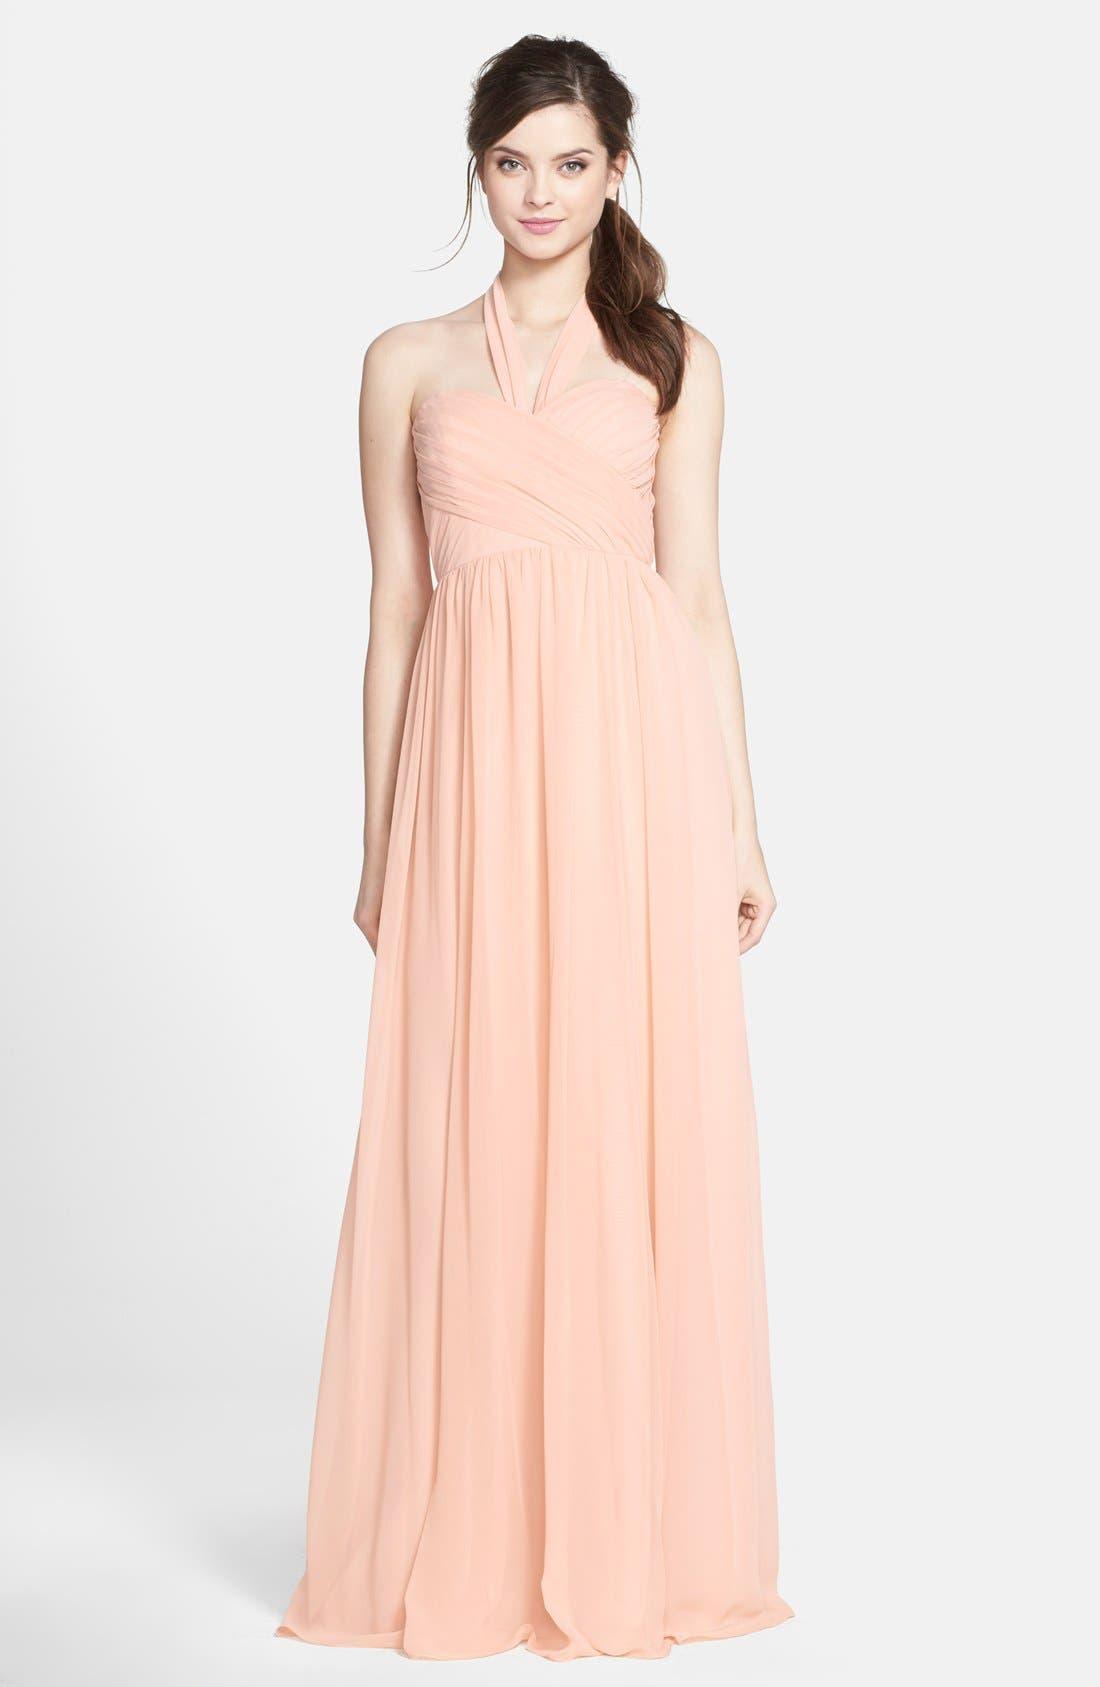 JENNY YOO 'Leah' Convertible Chiffon Gown